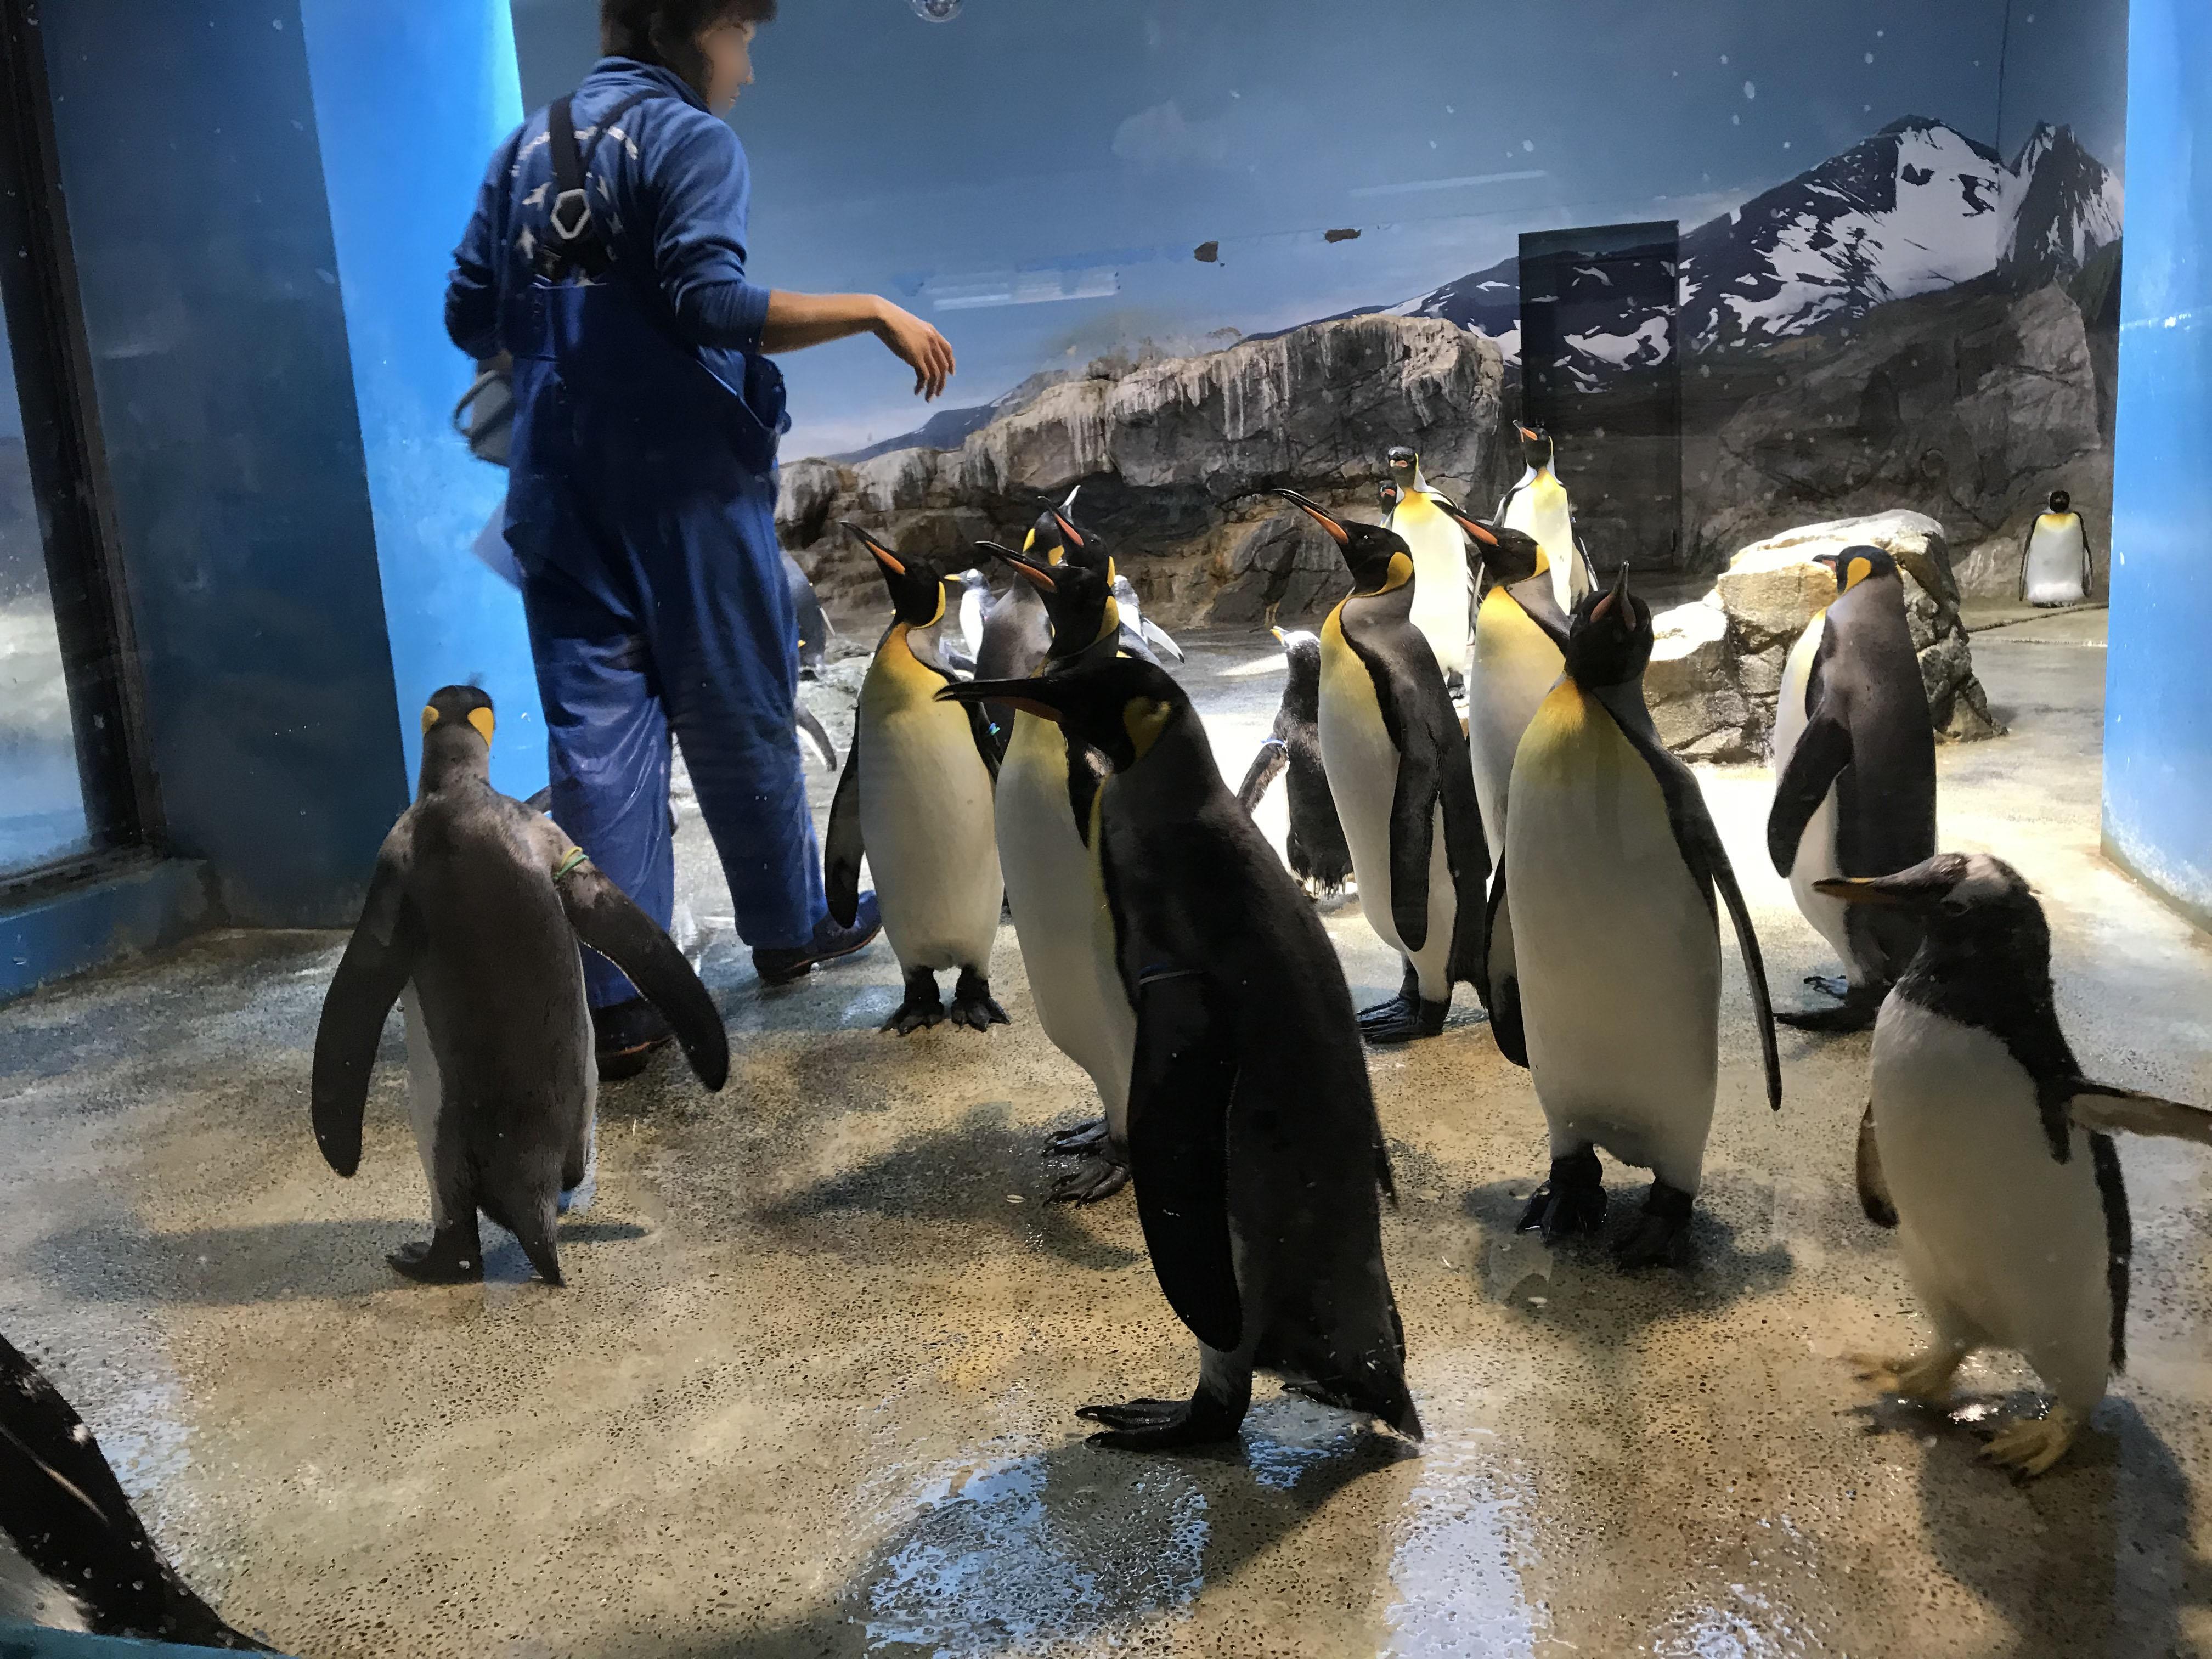 長崎 長崎市 「長崎ペンギン水族館」